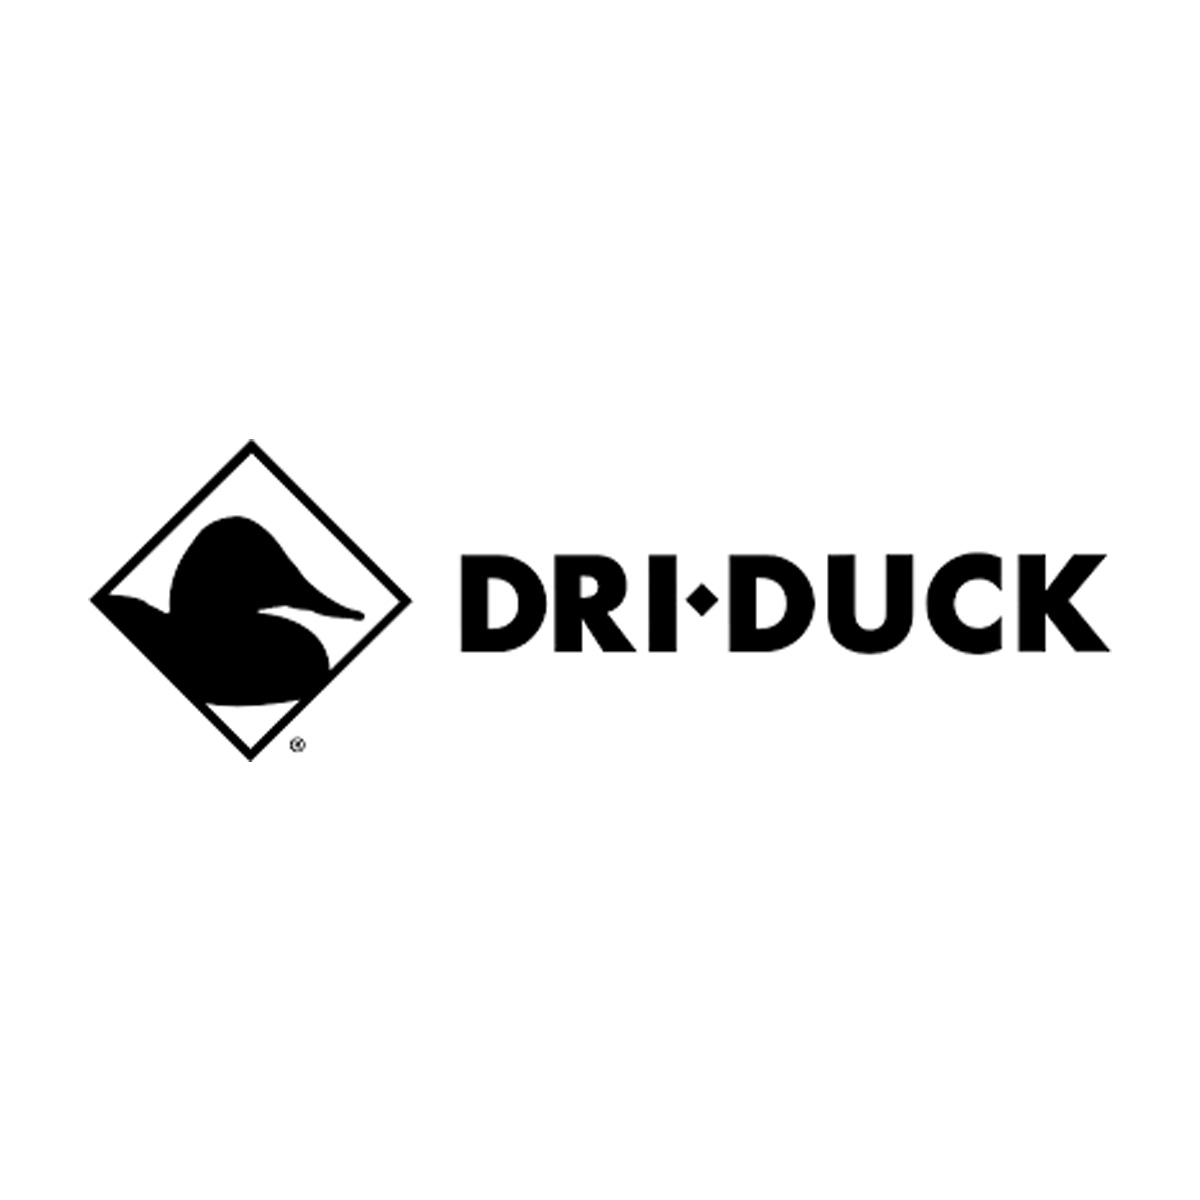 custom dri duck apparel dc ny md va